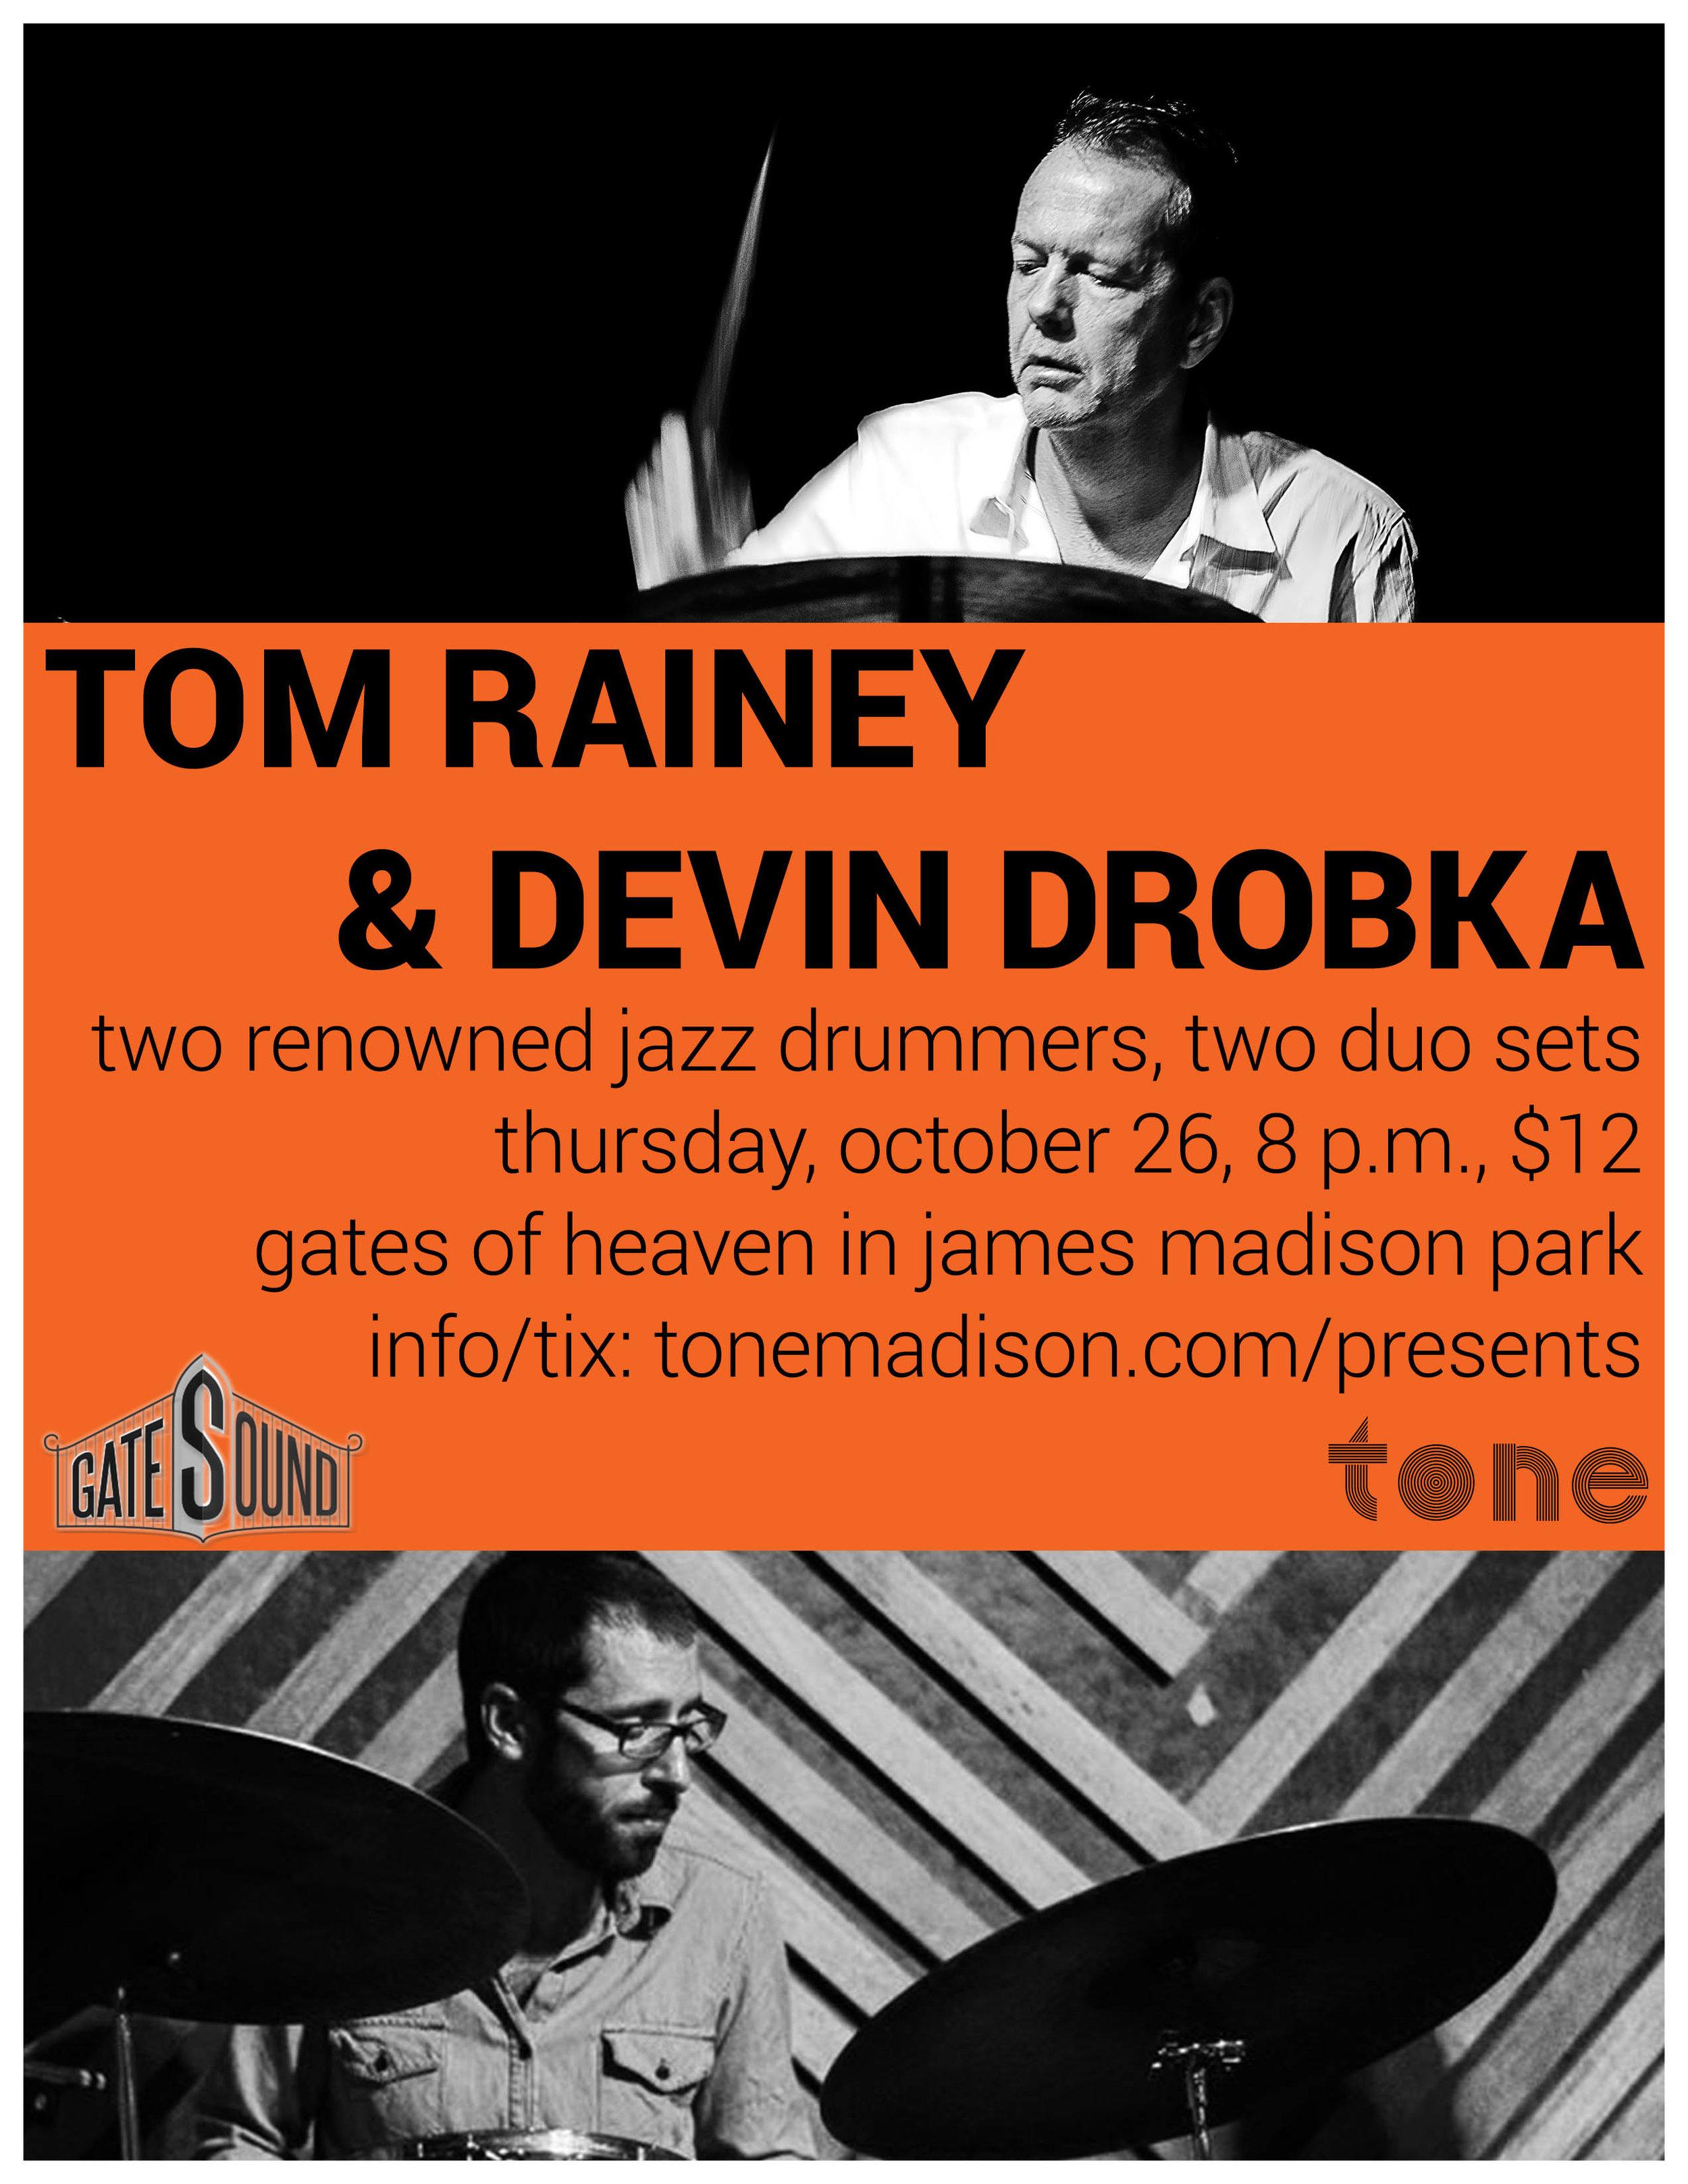 10/26/2017: Tom Rainey And Devin Drobka Duo